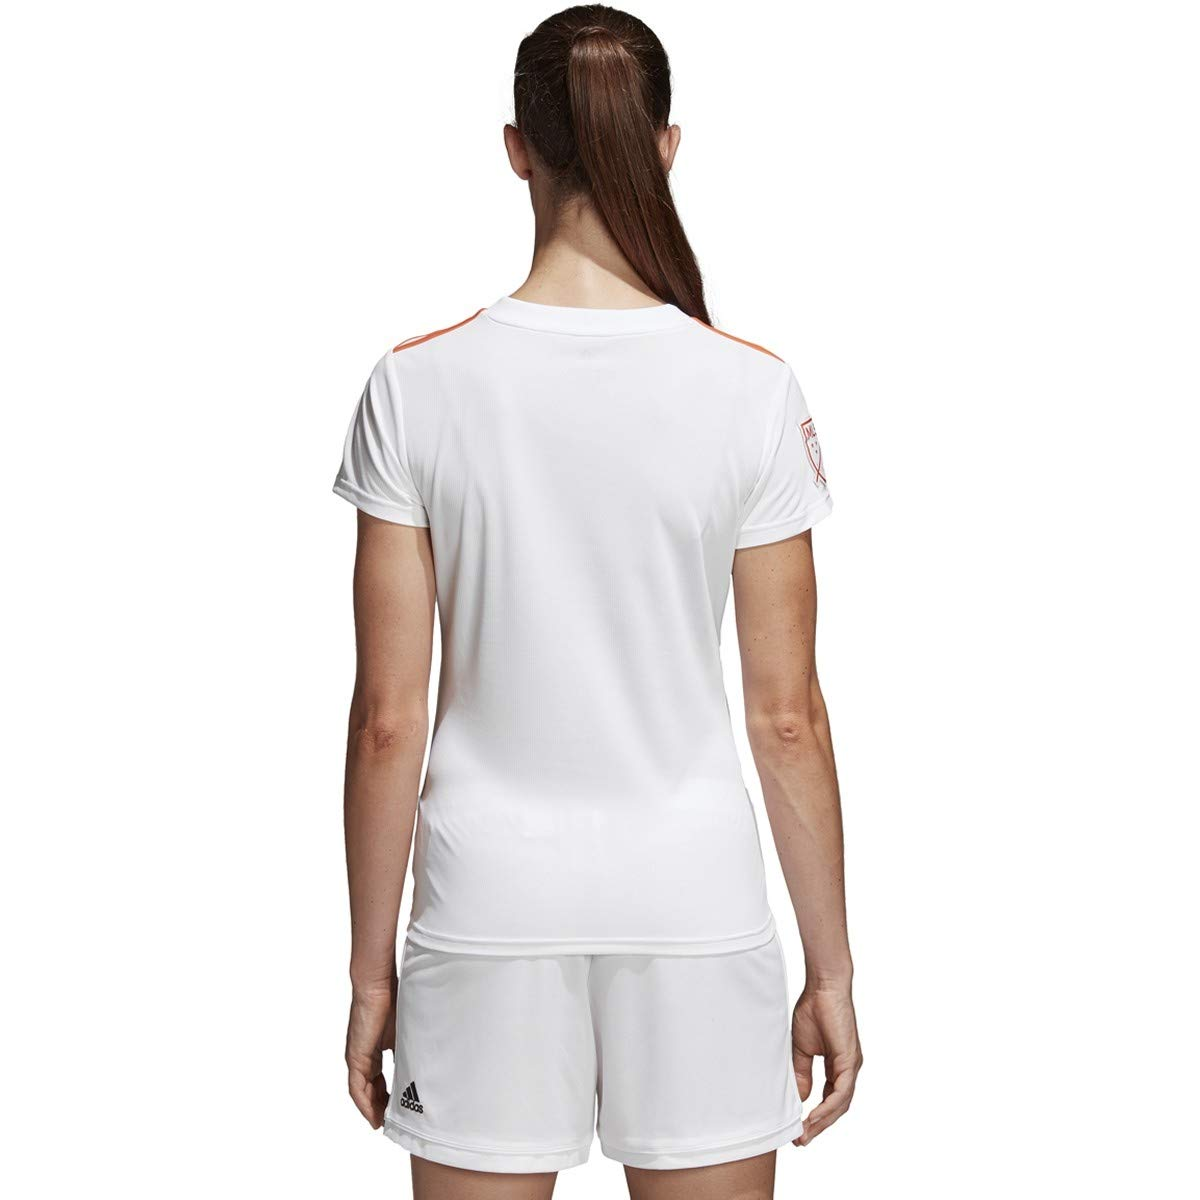 low priced f5bd5 49e86 adidas Atlanta United FC Women's Replica Jersey White